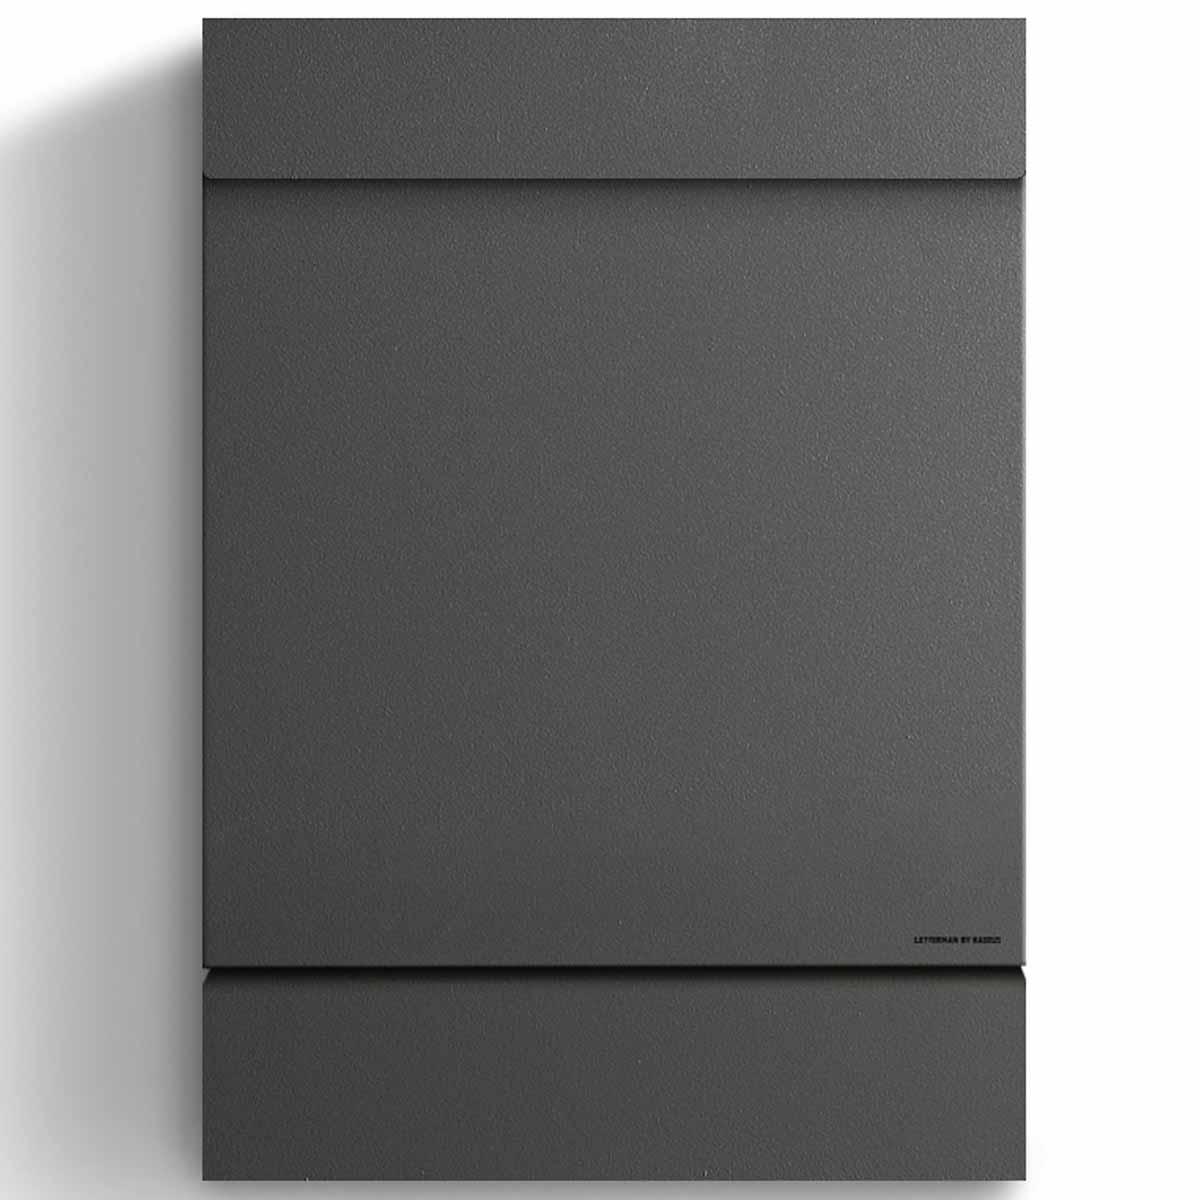 letterman m anthrazit ral 7016 radius briefkasten. Black Bedroom Furniture Sets. Home Design Ideas